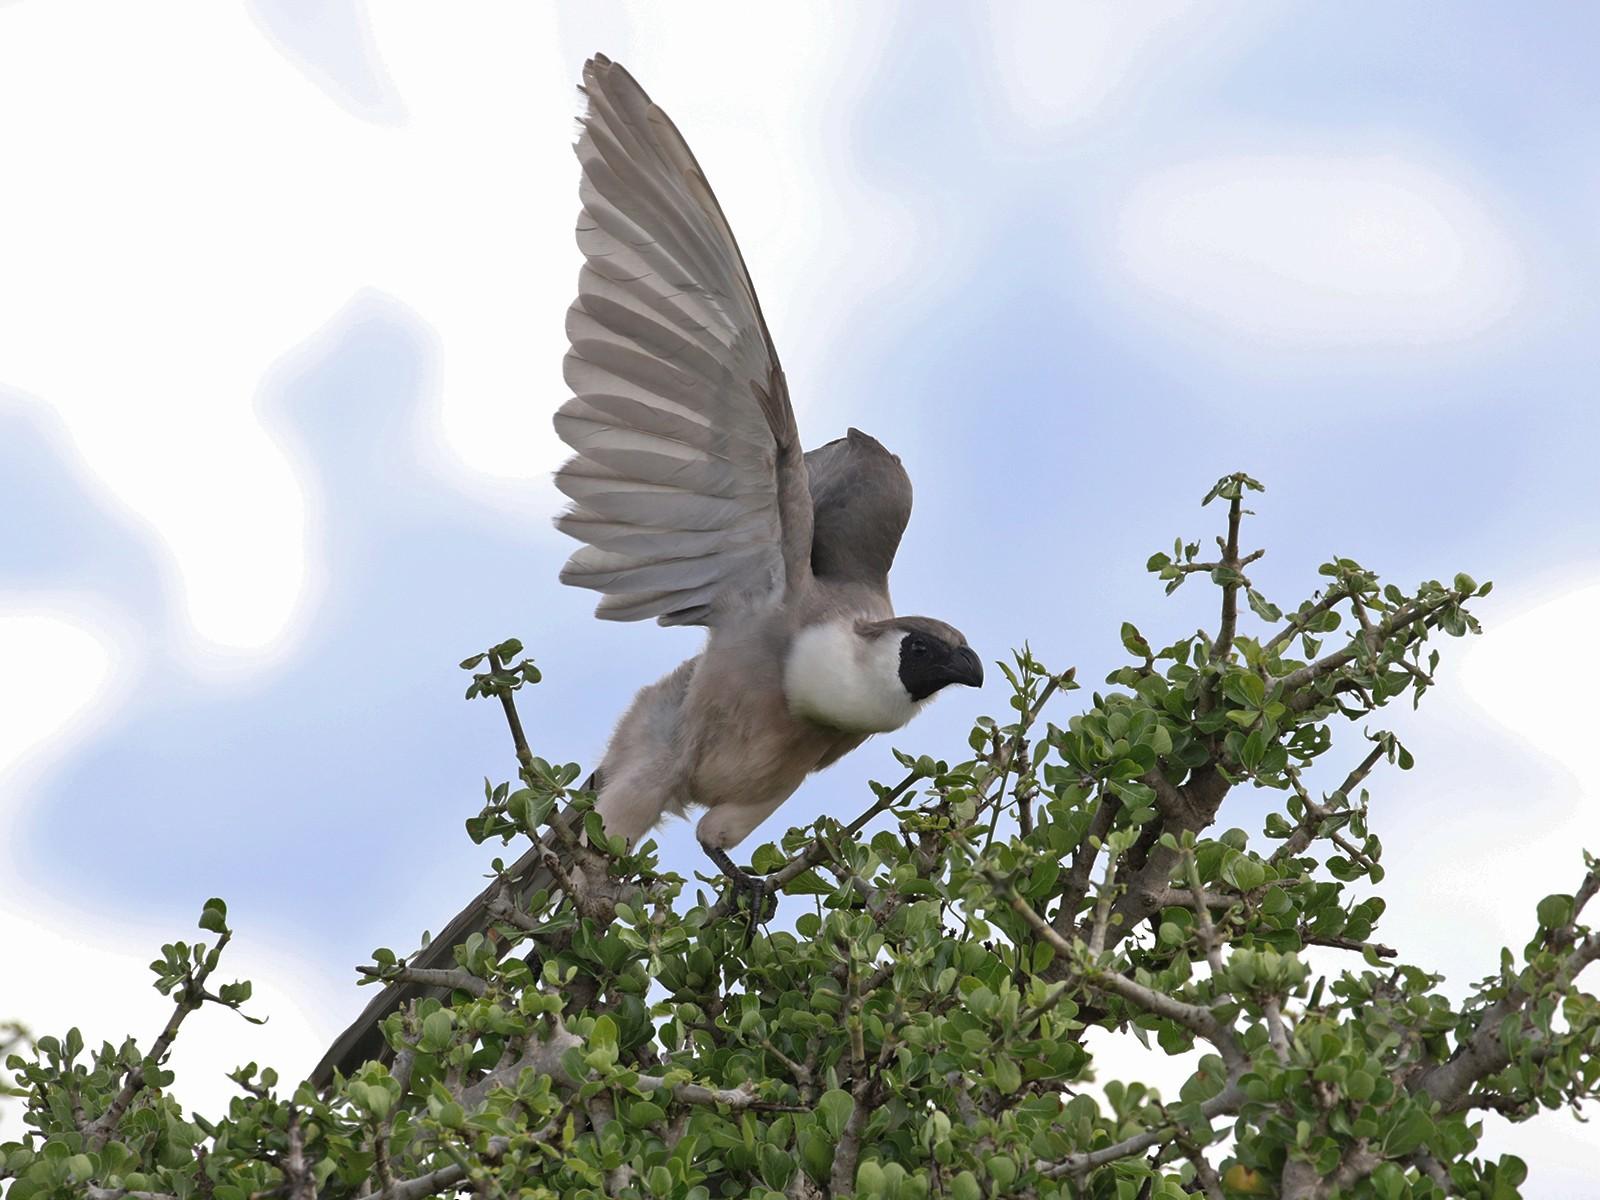 Bare-faced Go-away-bird - Charley Hesse TROPICAL BIRDING